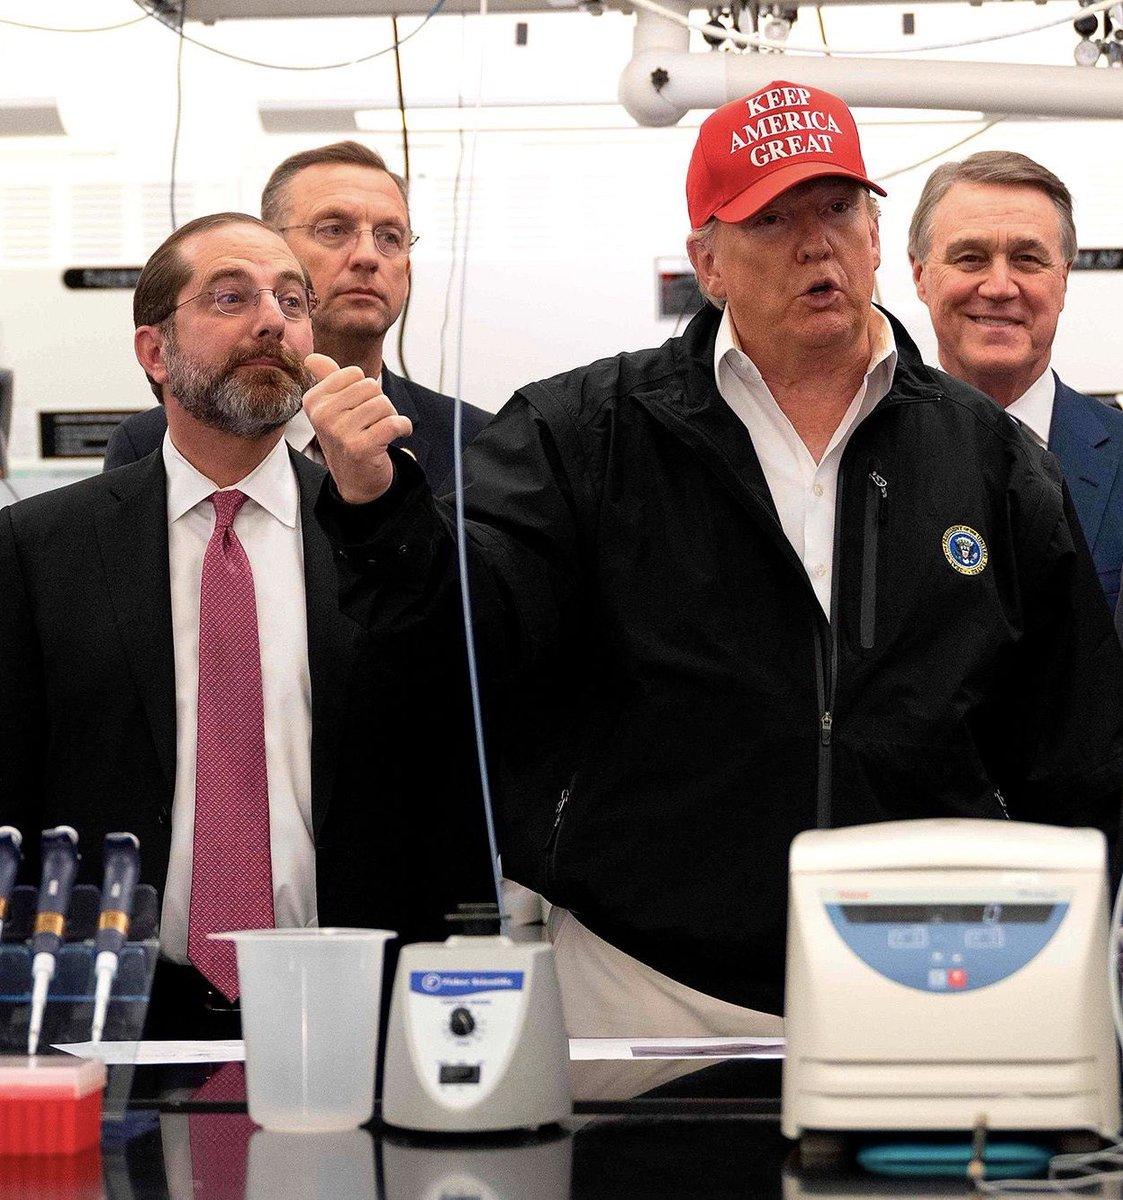 #TrumpVirus looks ridiculous wearing a #KeepAmericaGreat hat as he bungles his #coronavirus response